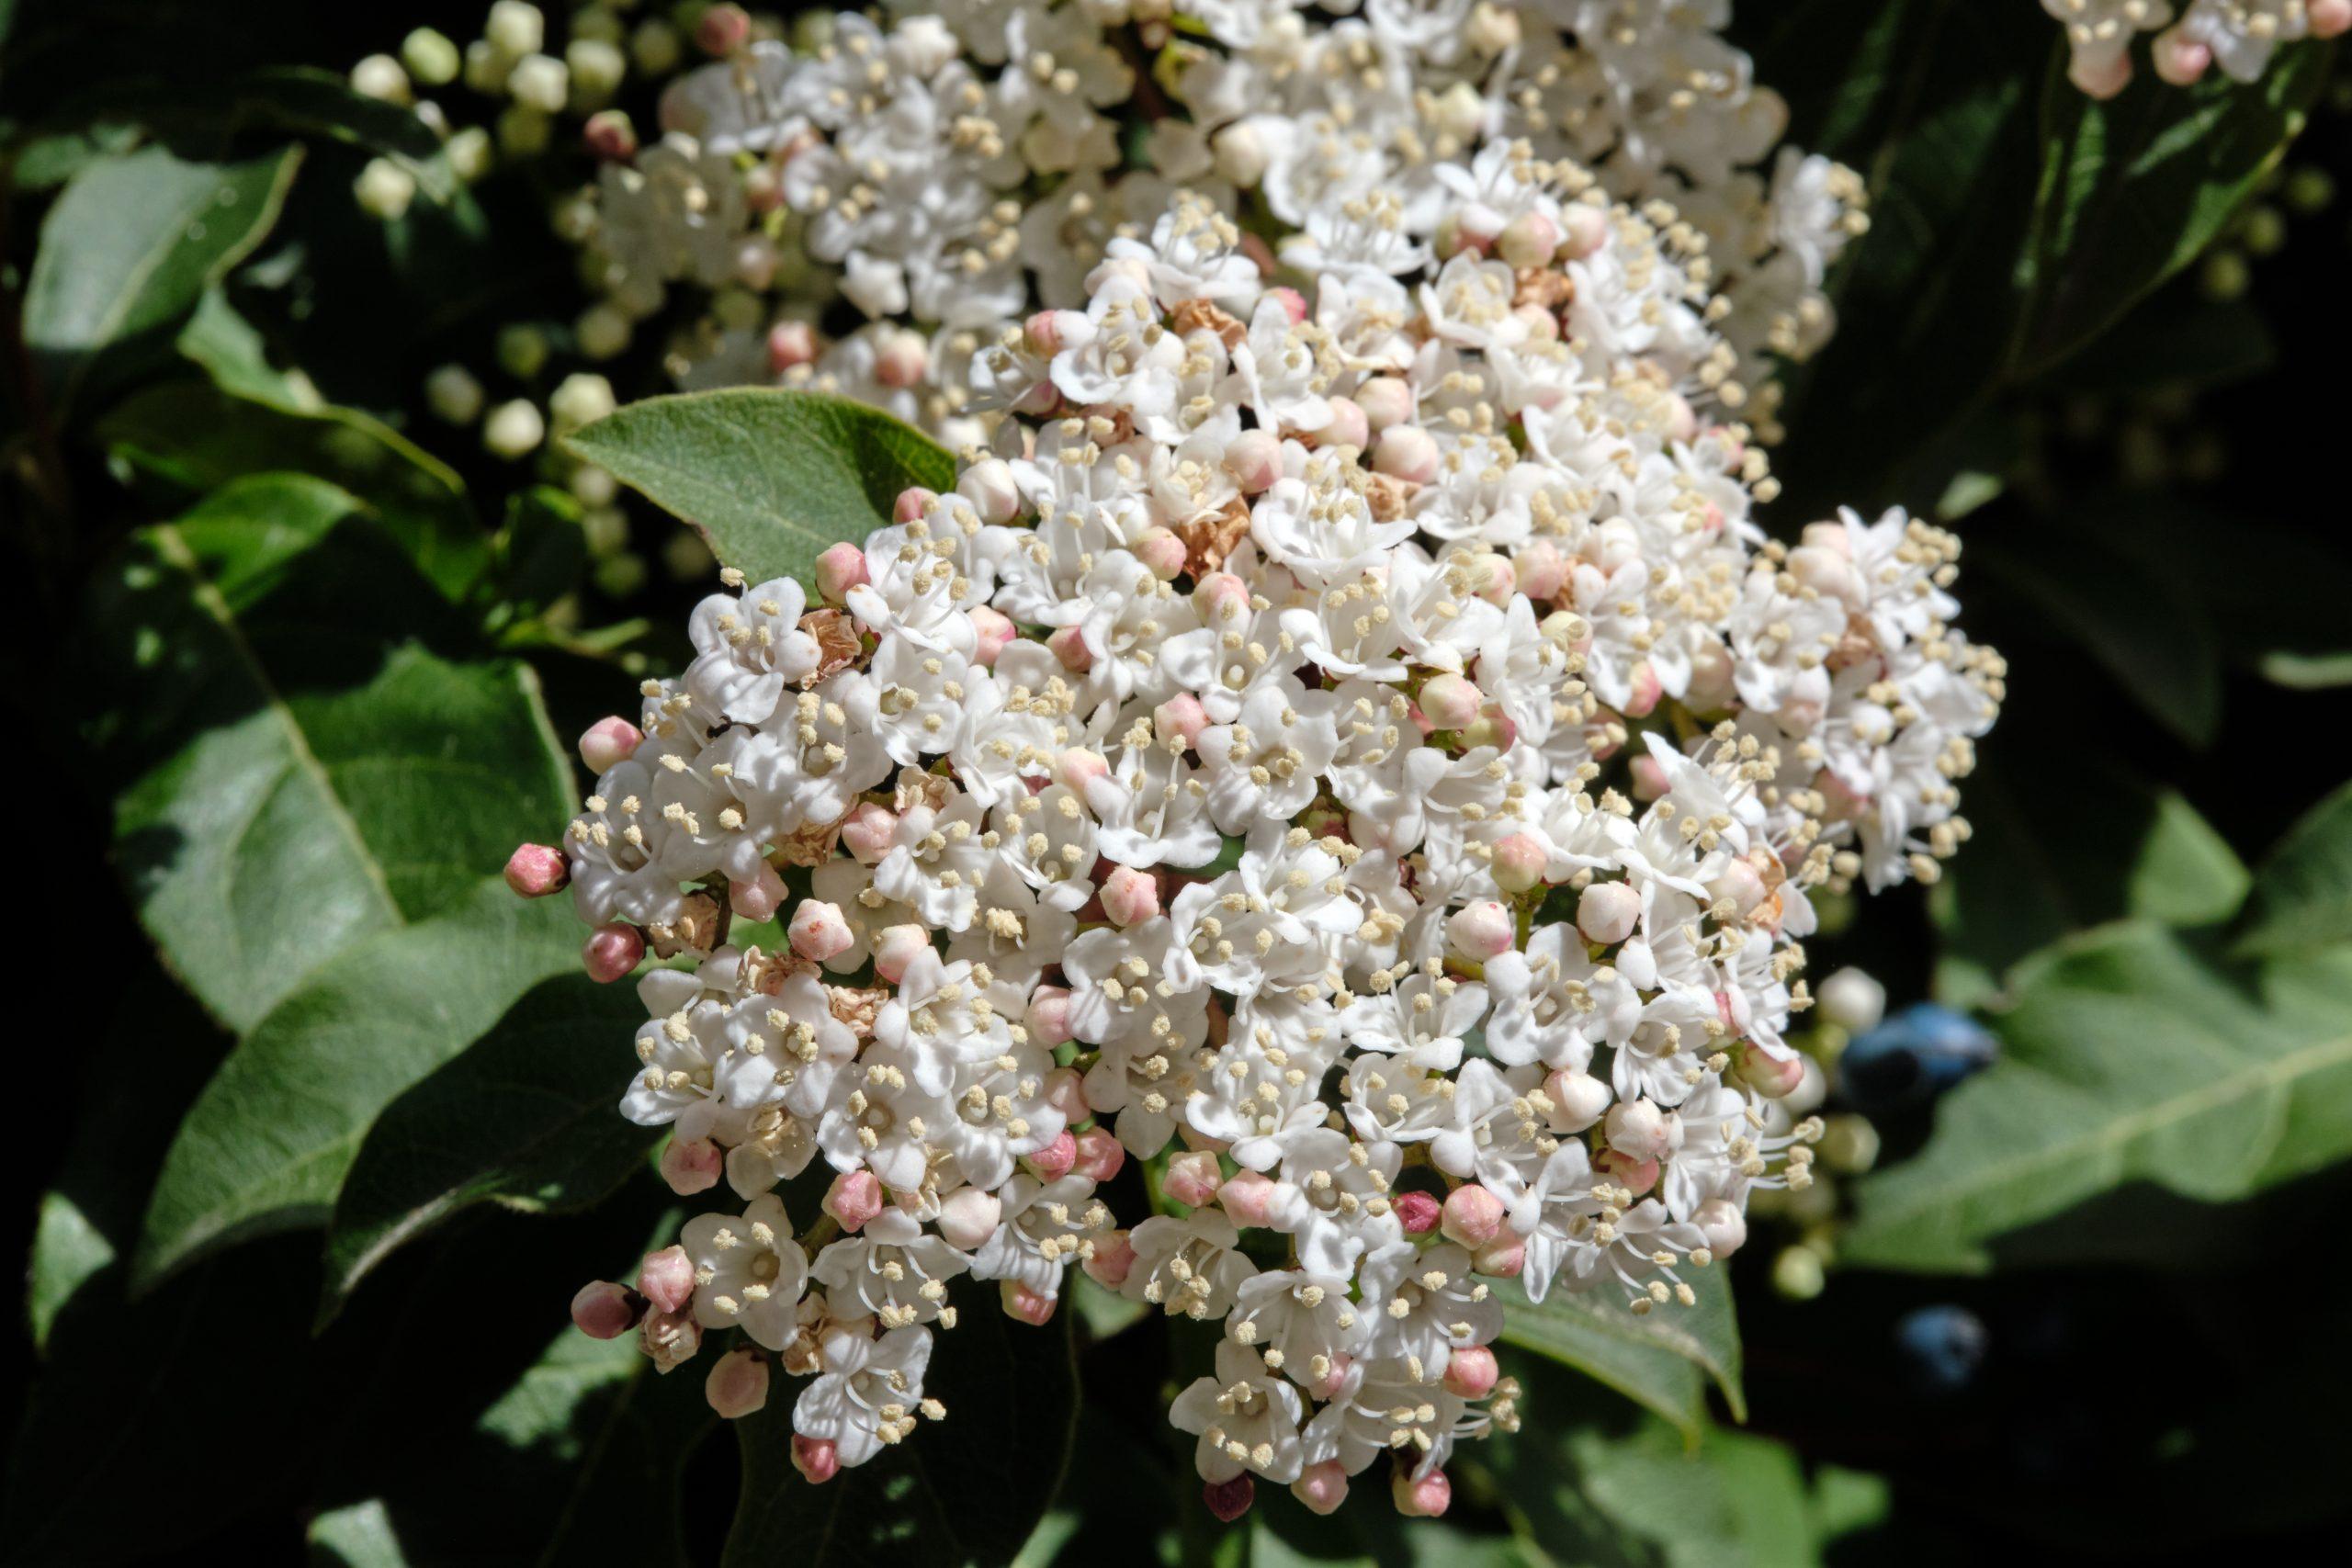 Mystery Flowering Bush 8 April 2021 Oregon Copyright Steve J Davis